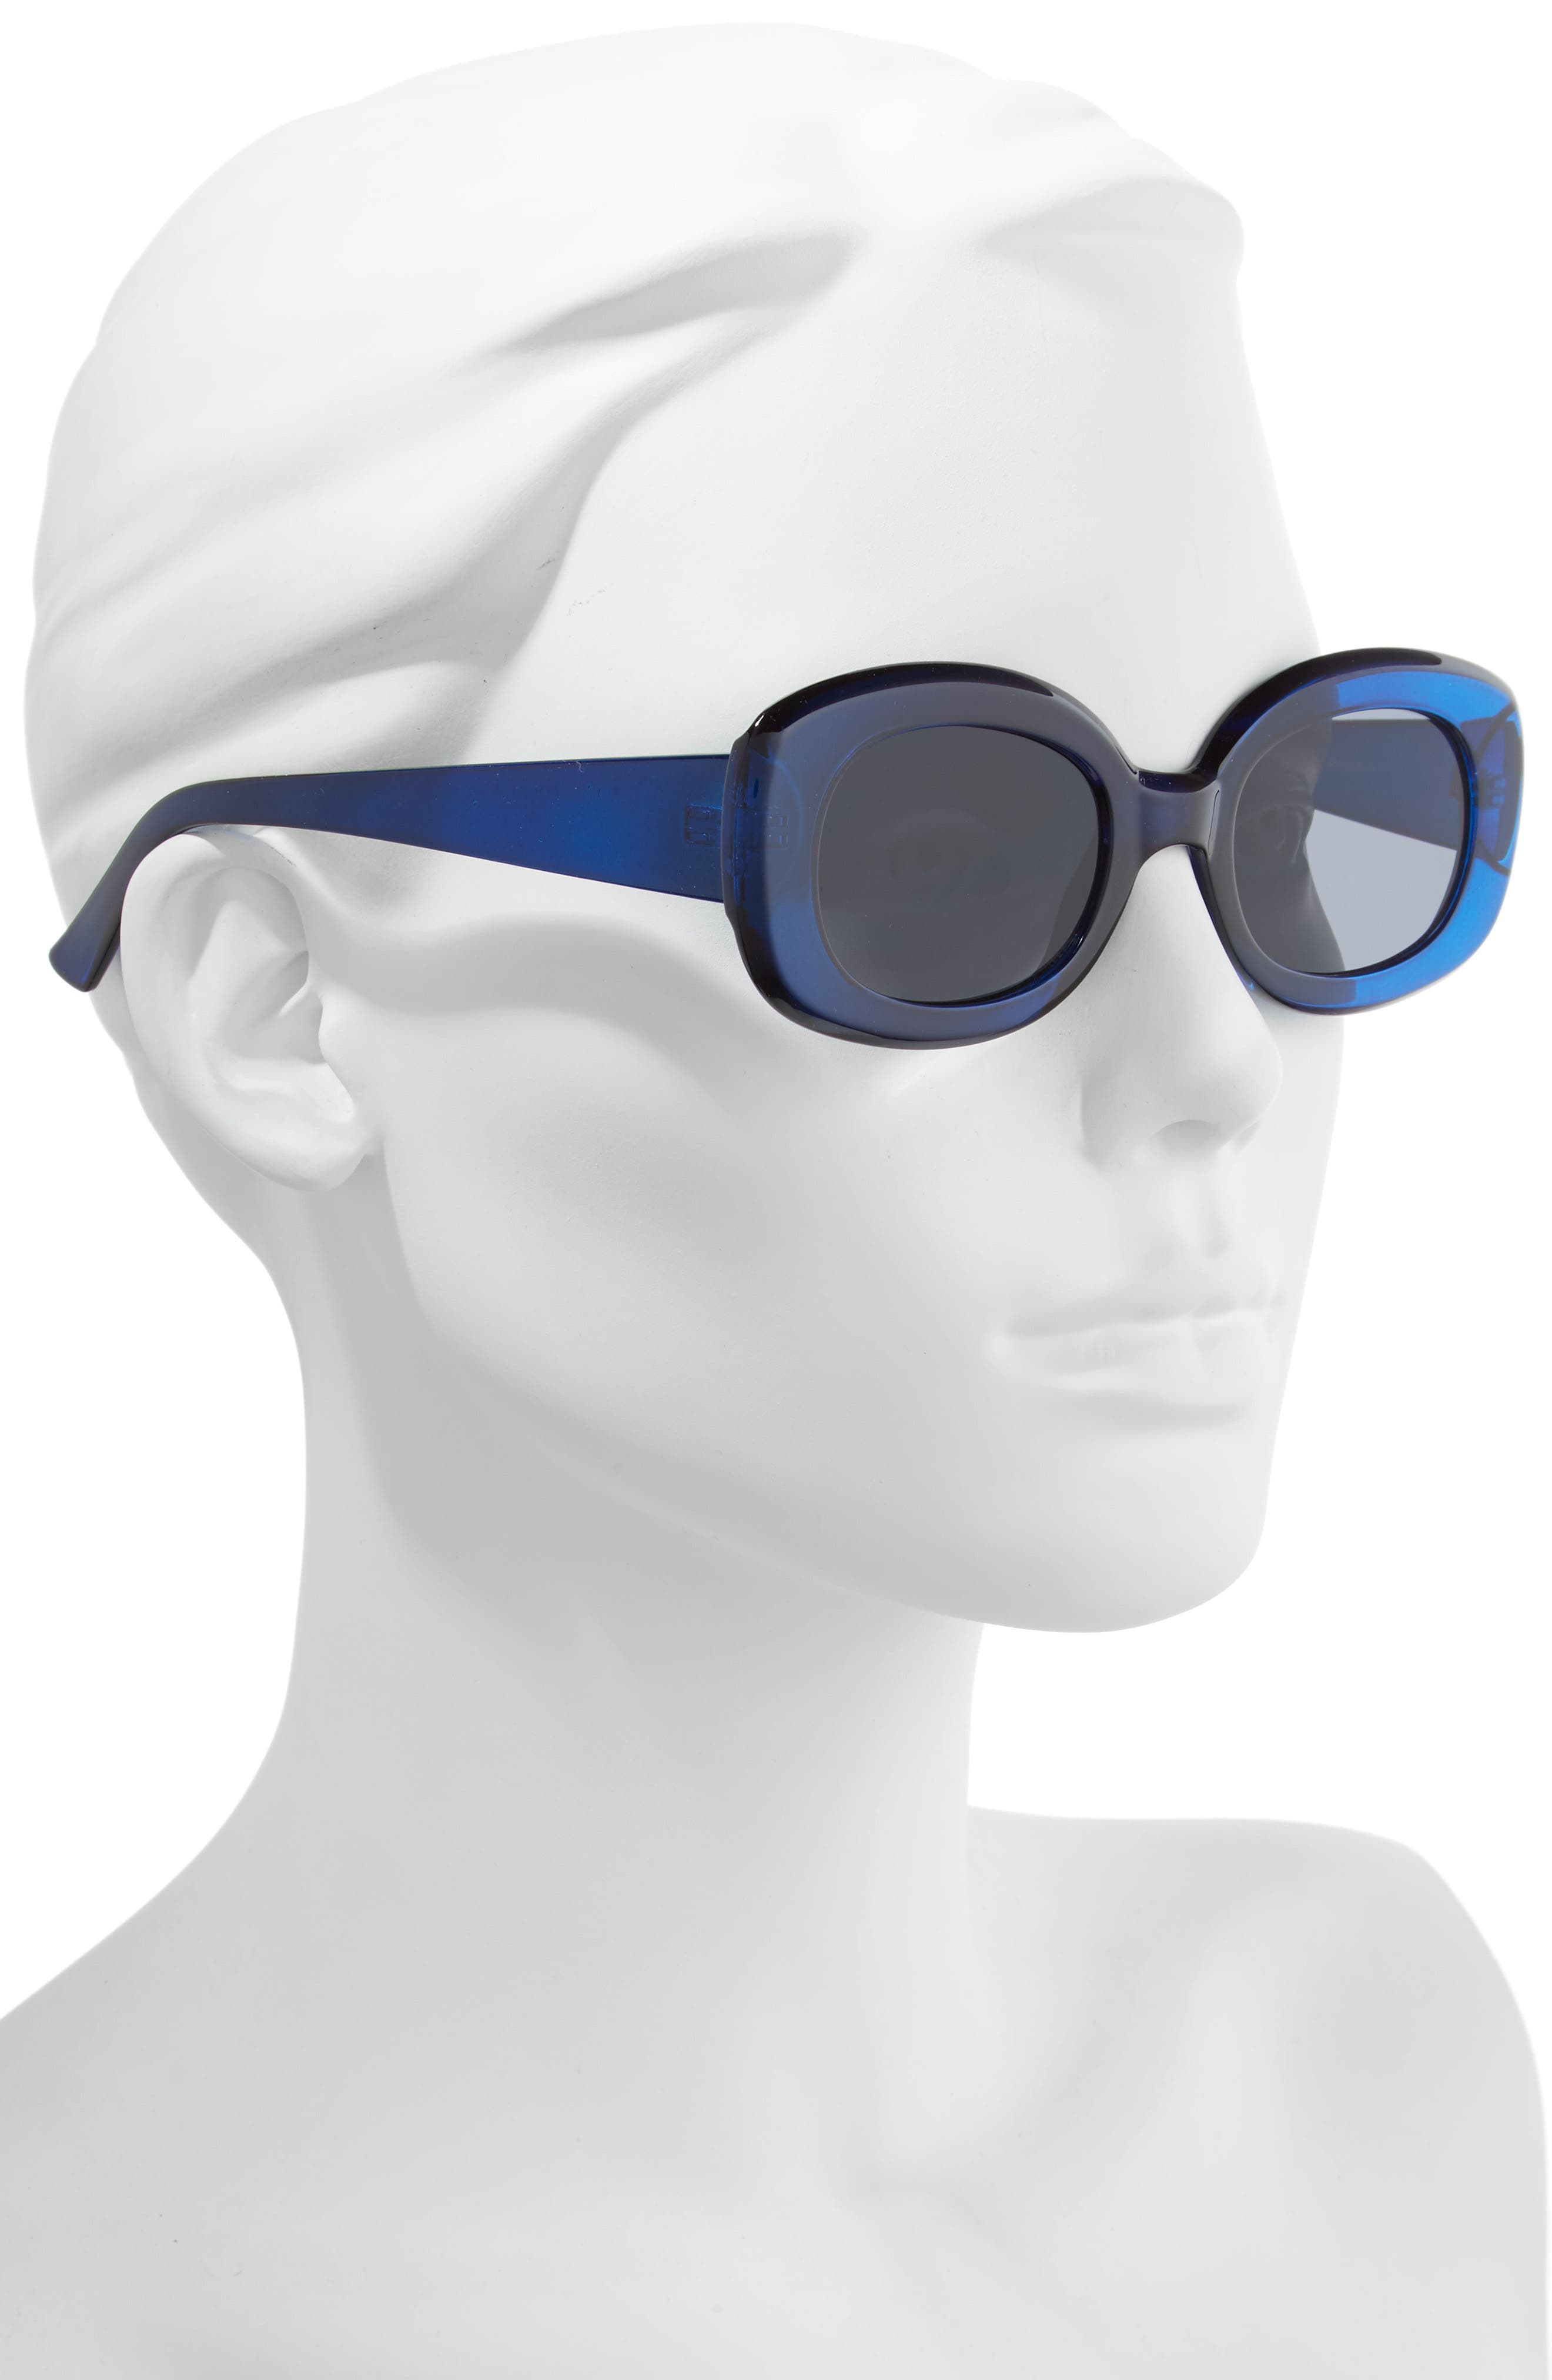 66mm Oval Sunglasses,                             Alternate thumbnail 2, color,                             BLUE/ BLACK